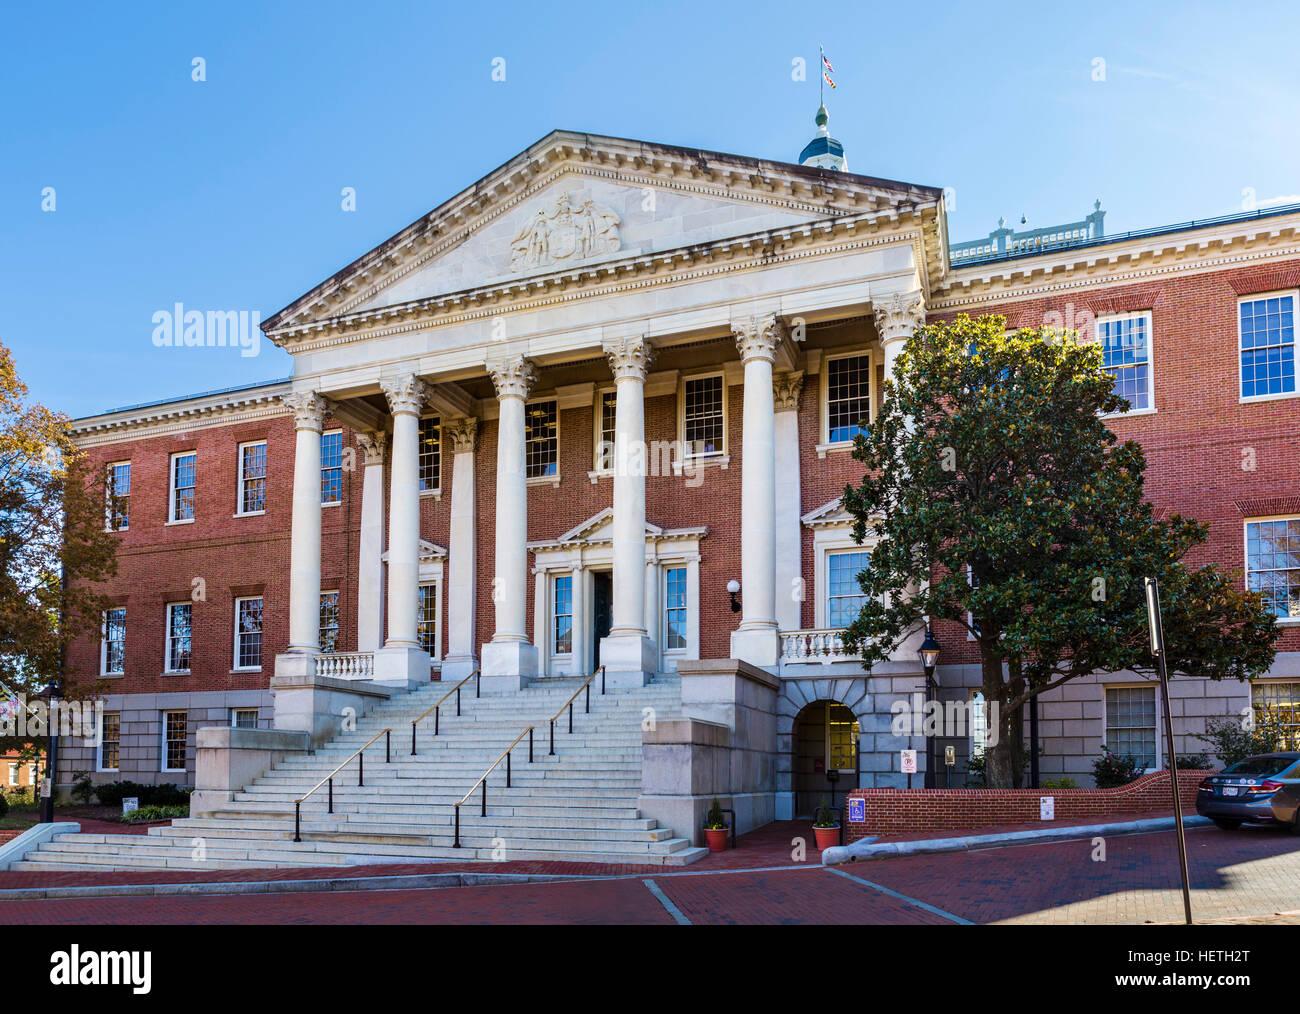 Maryland State House, Annapolis, Maryland, USA - Stock Image